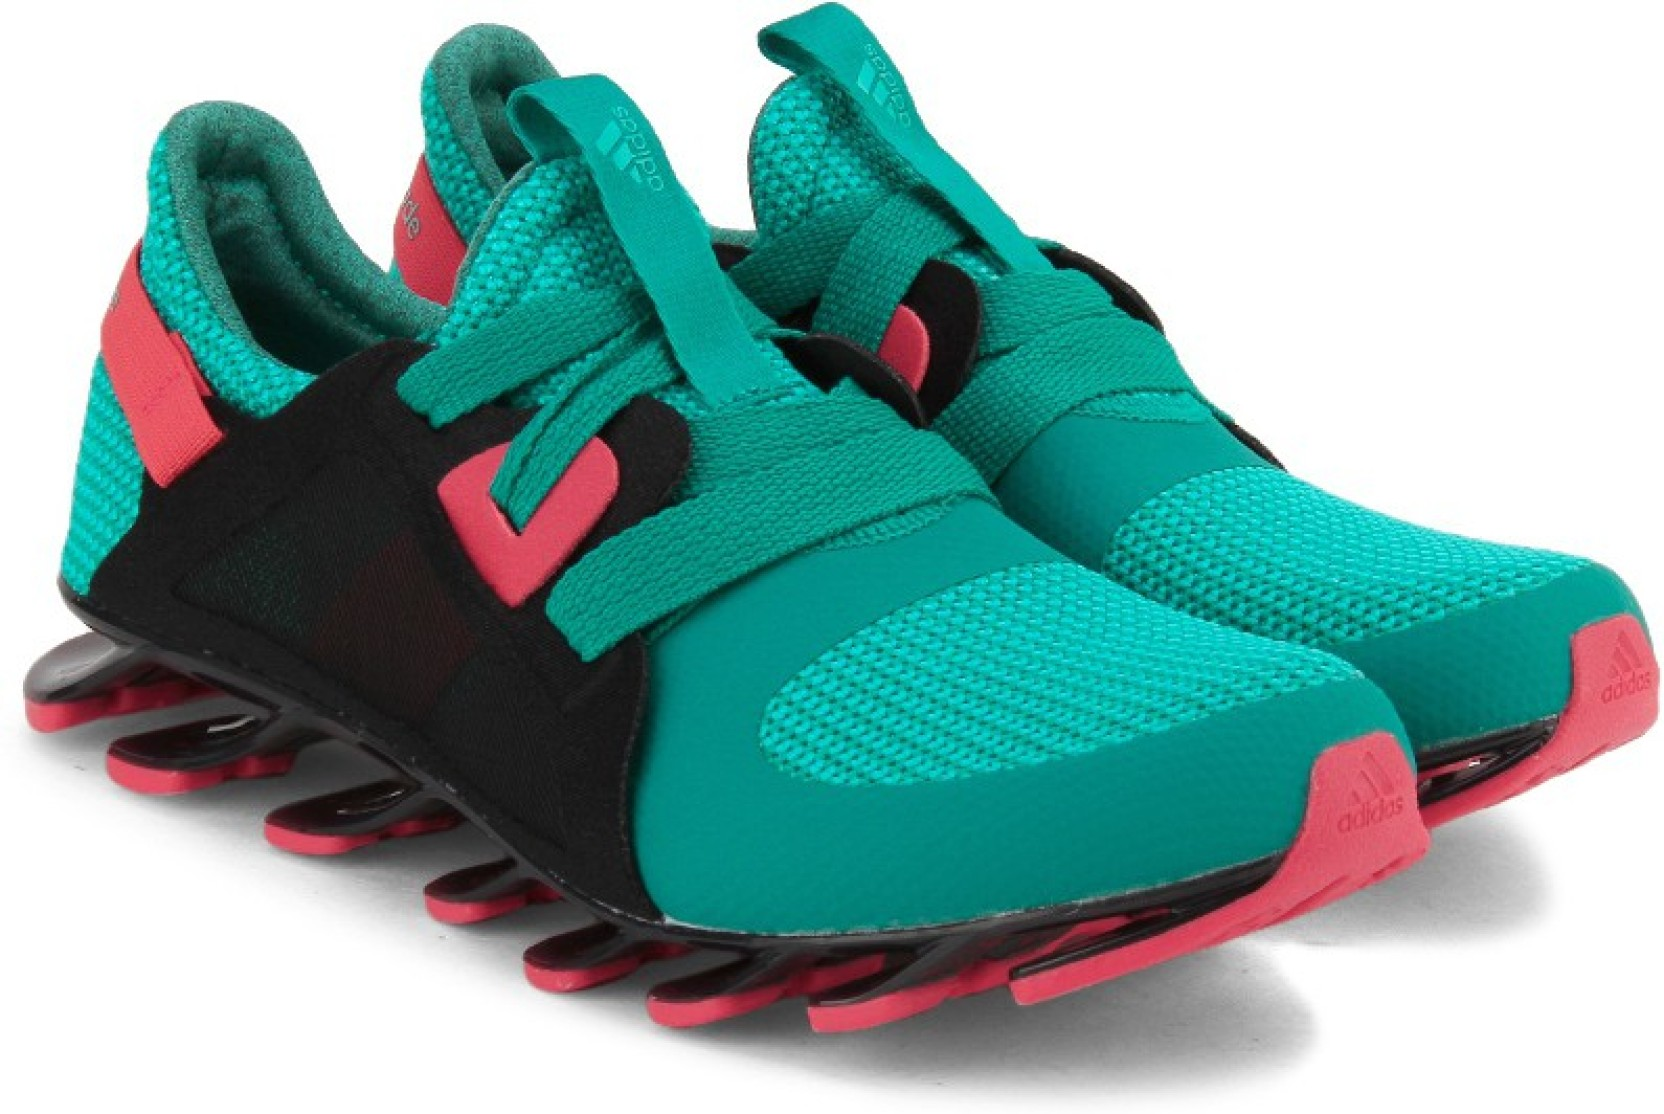 finest selection b94c8 274bd ADIDAS SPRINGBLADE NANAYA Sneakers For Women